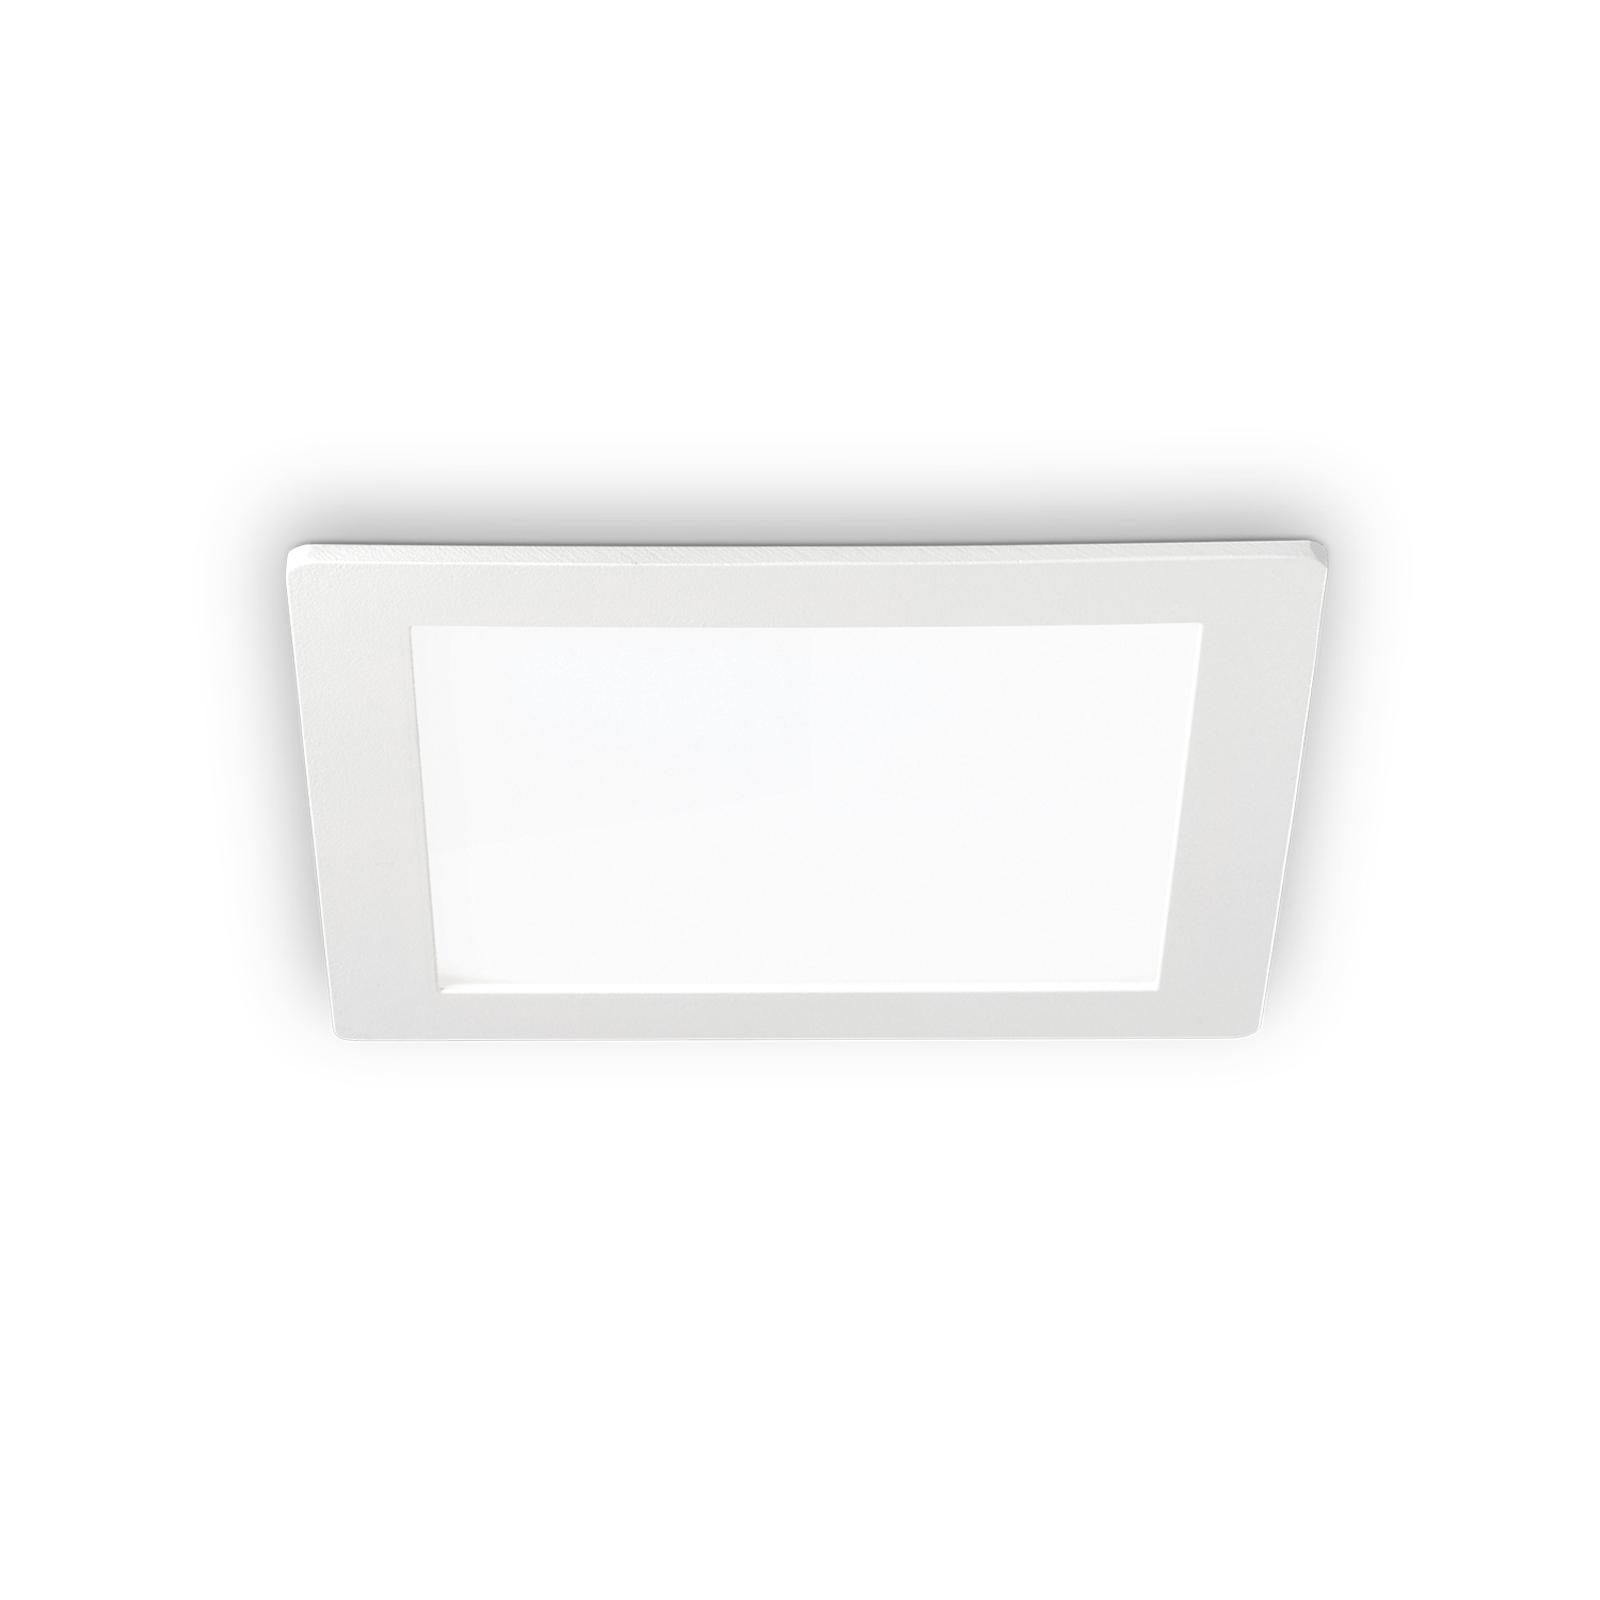 LED-Deckeneinbauleuchte Groove square 11,8x11,8 cm